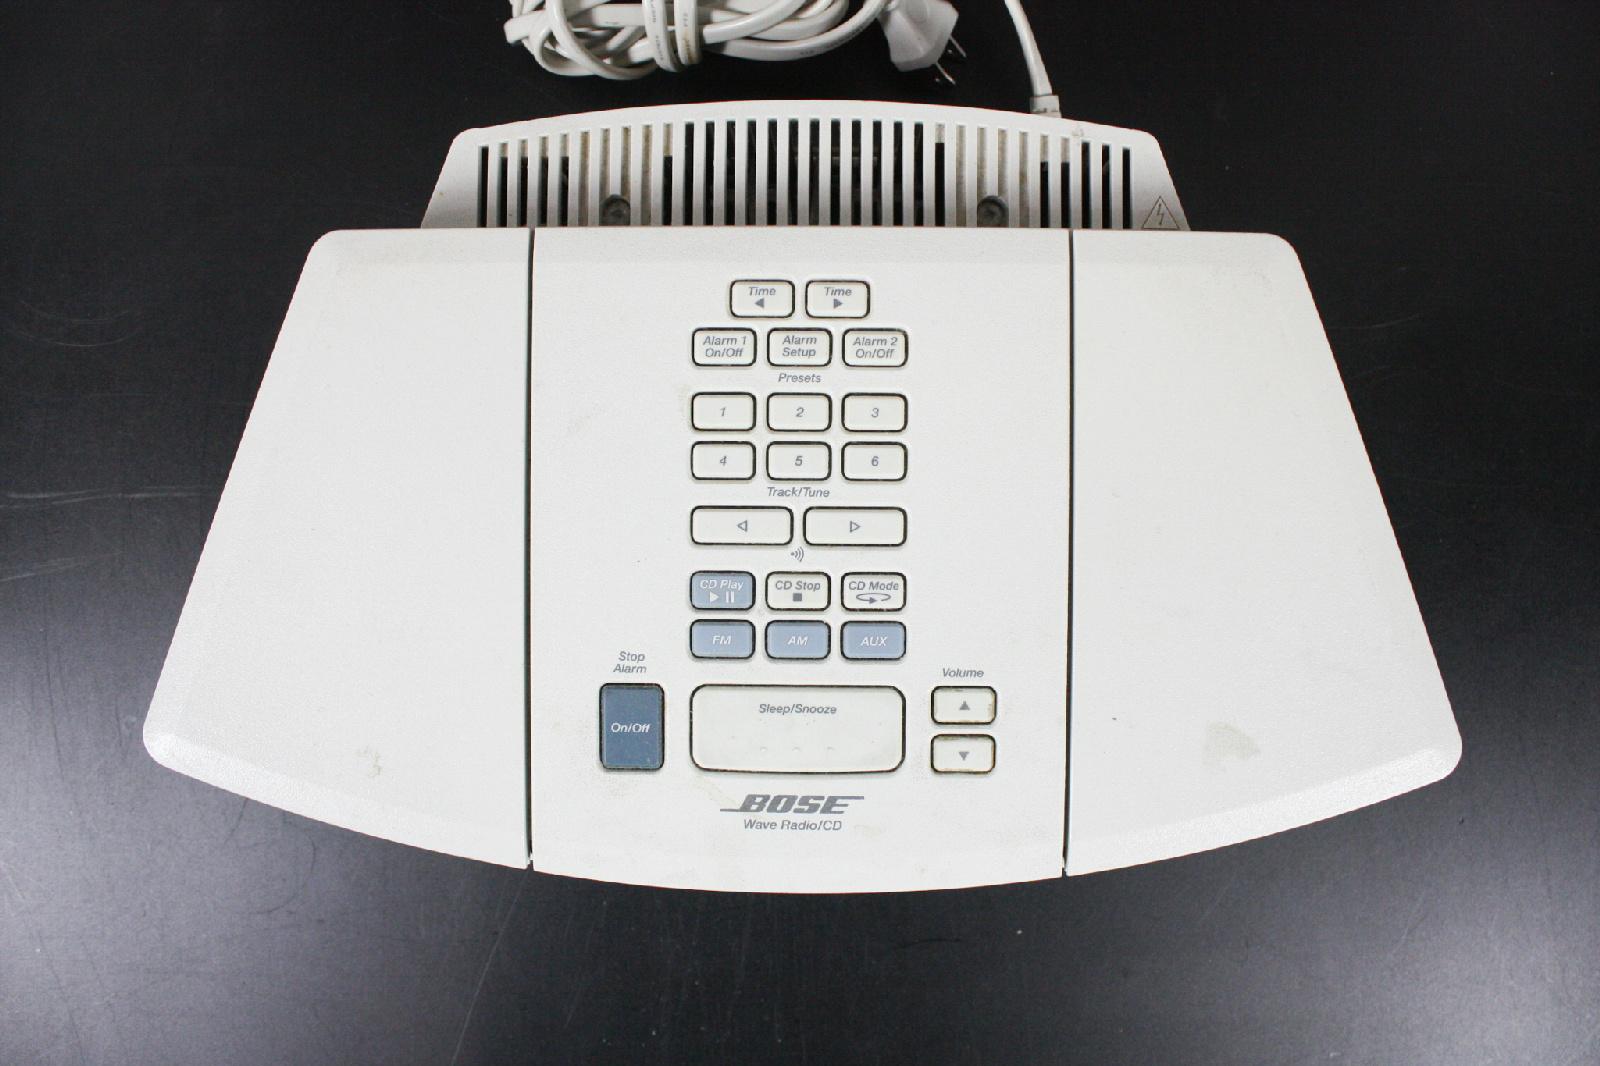 bose awrc1p am fm wave radio cd player alarm clock ebay. Black Bedroom Furniture Sets. Home Design Ideas